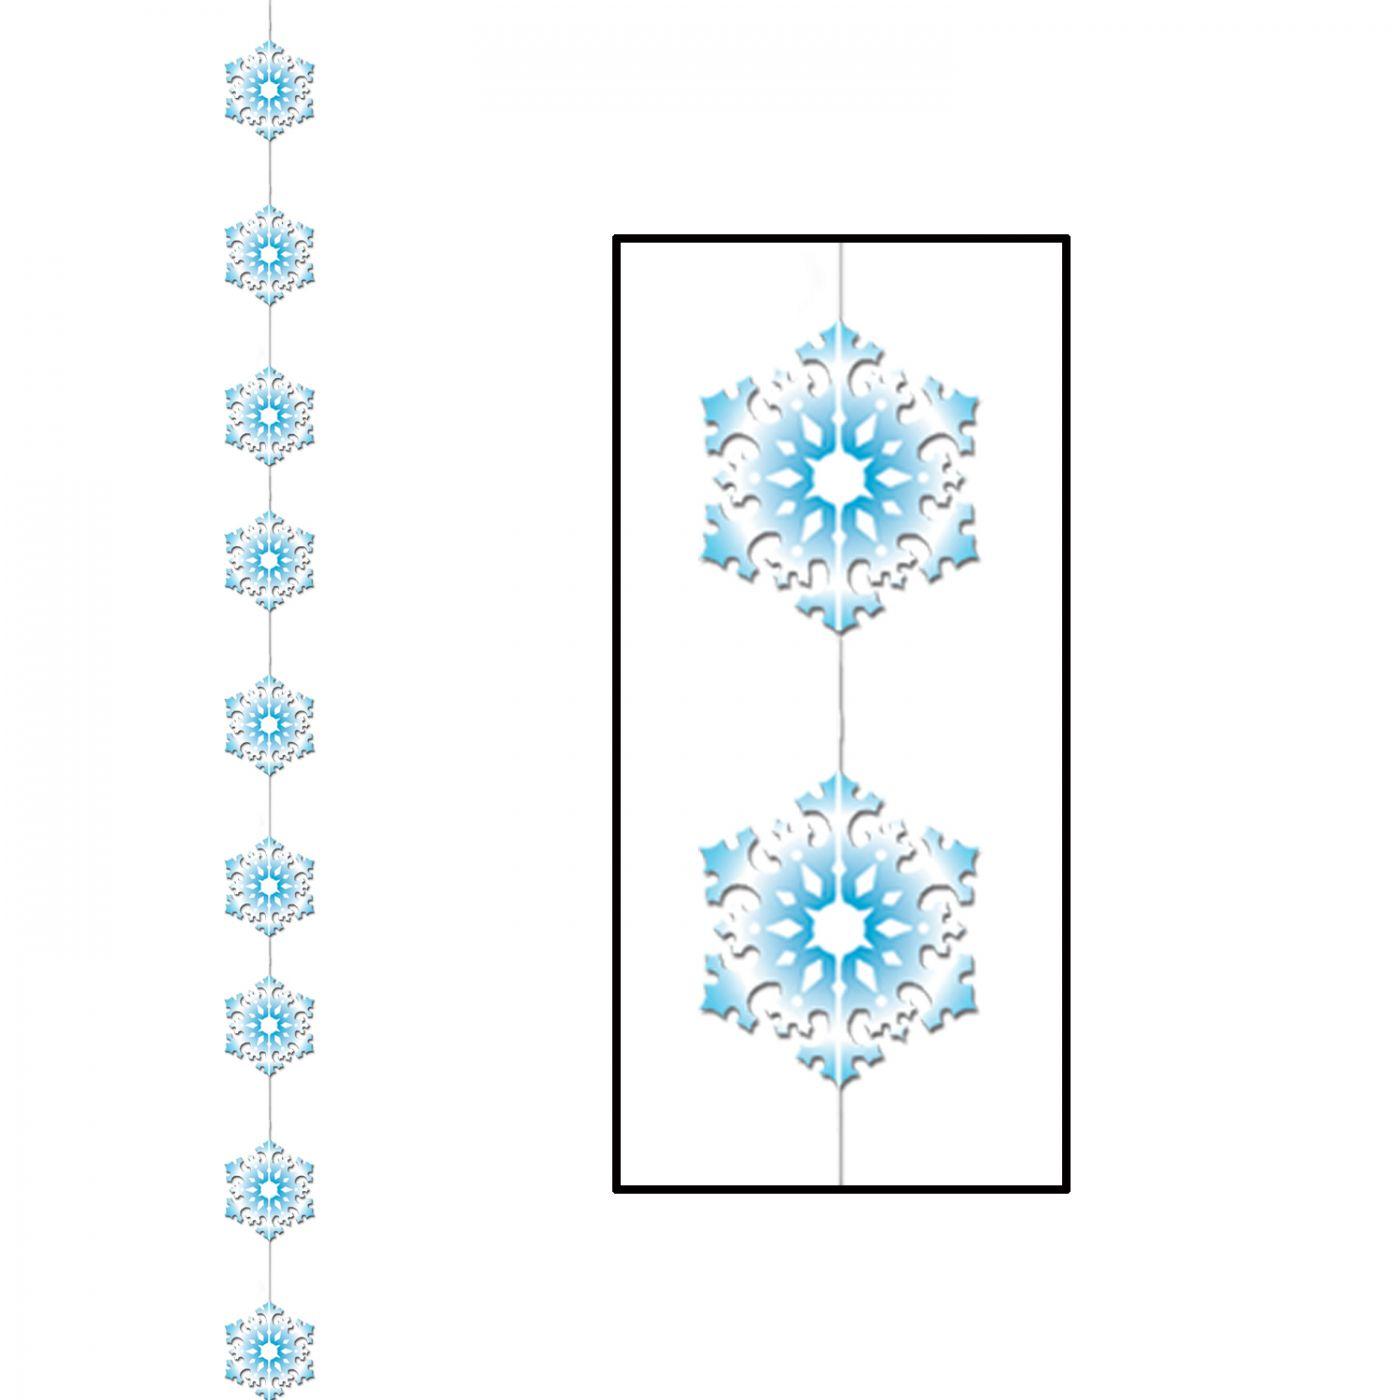 Snowflake Stringer image